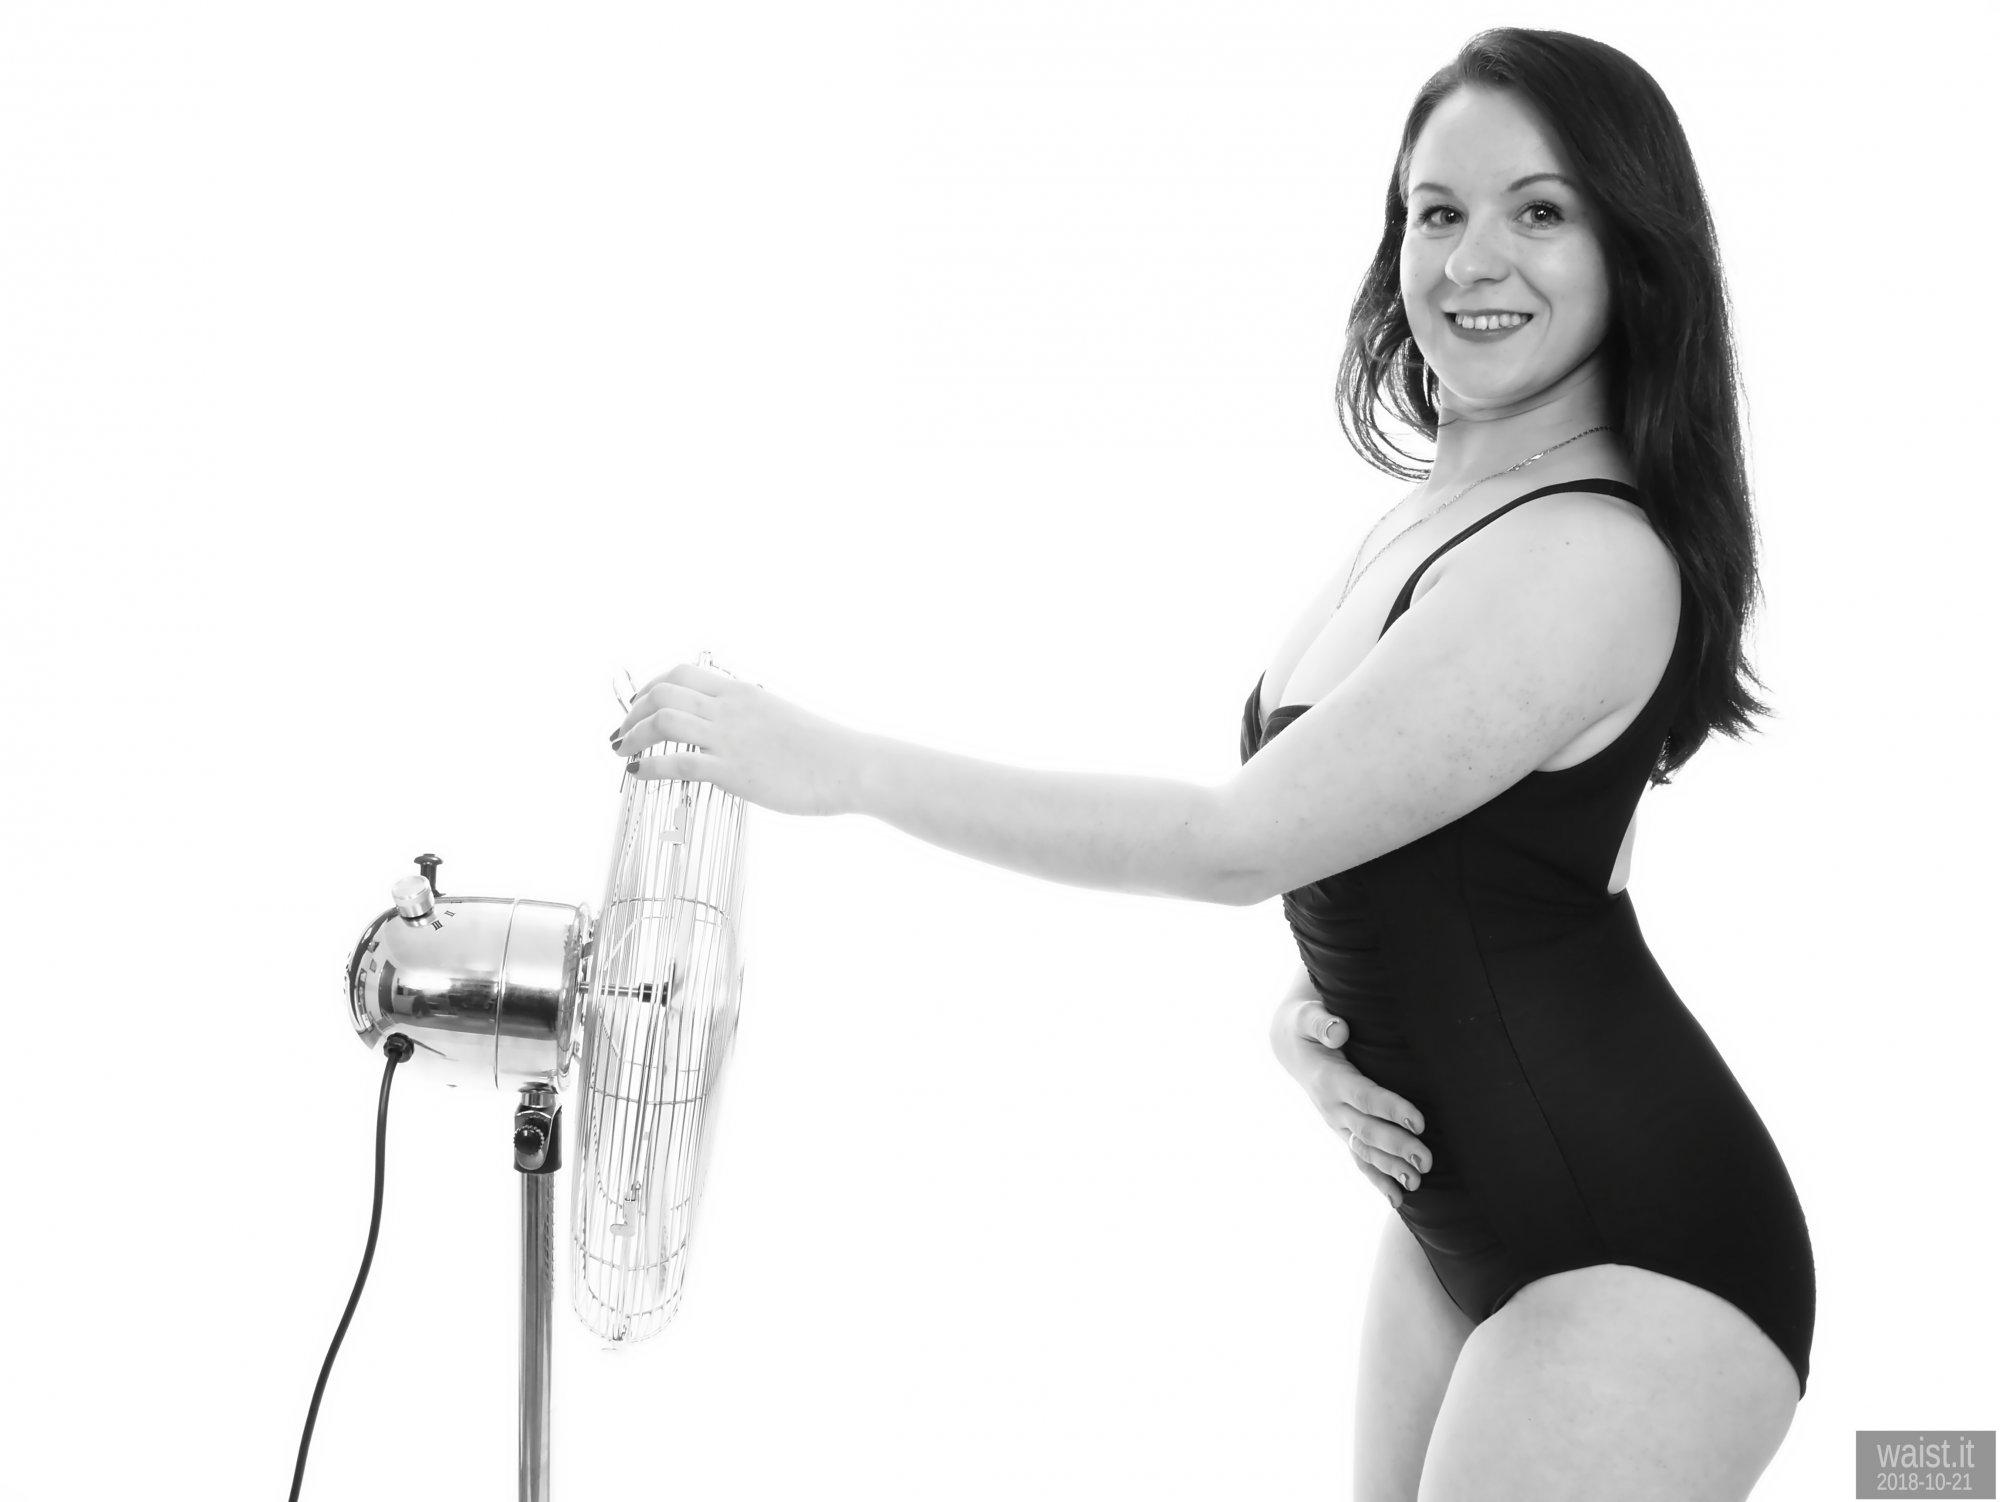 2018-10-21 Darya (DaryaM) in vintage black Crol Wior tummy-control one-piece swimsuit